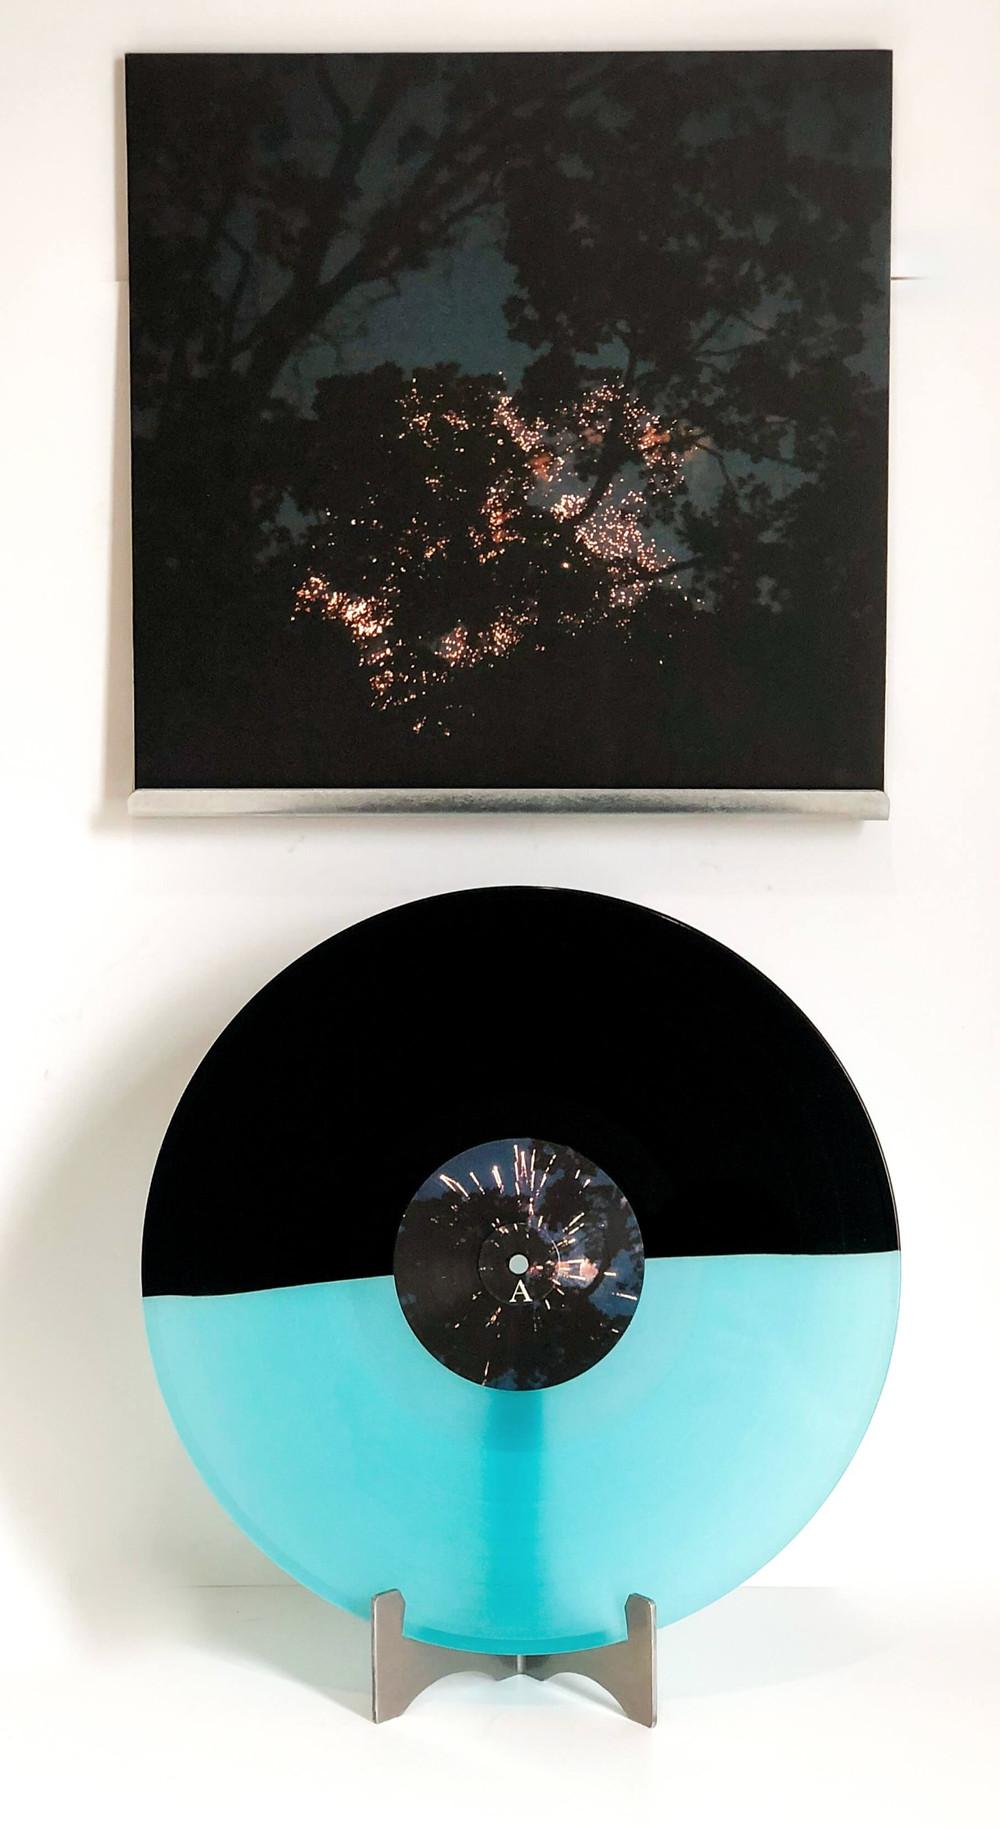 Vinyl Record Variant - Half black and half seafoam green - Gleemer Down Through